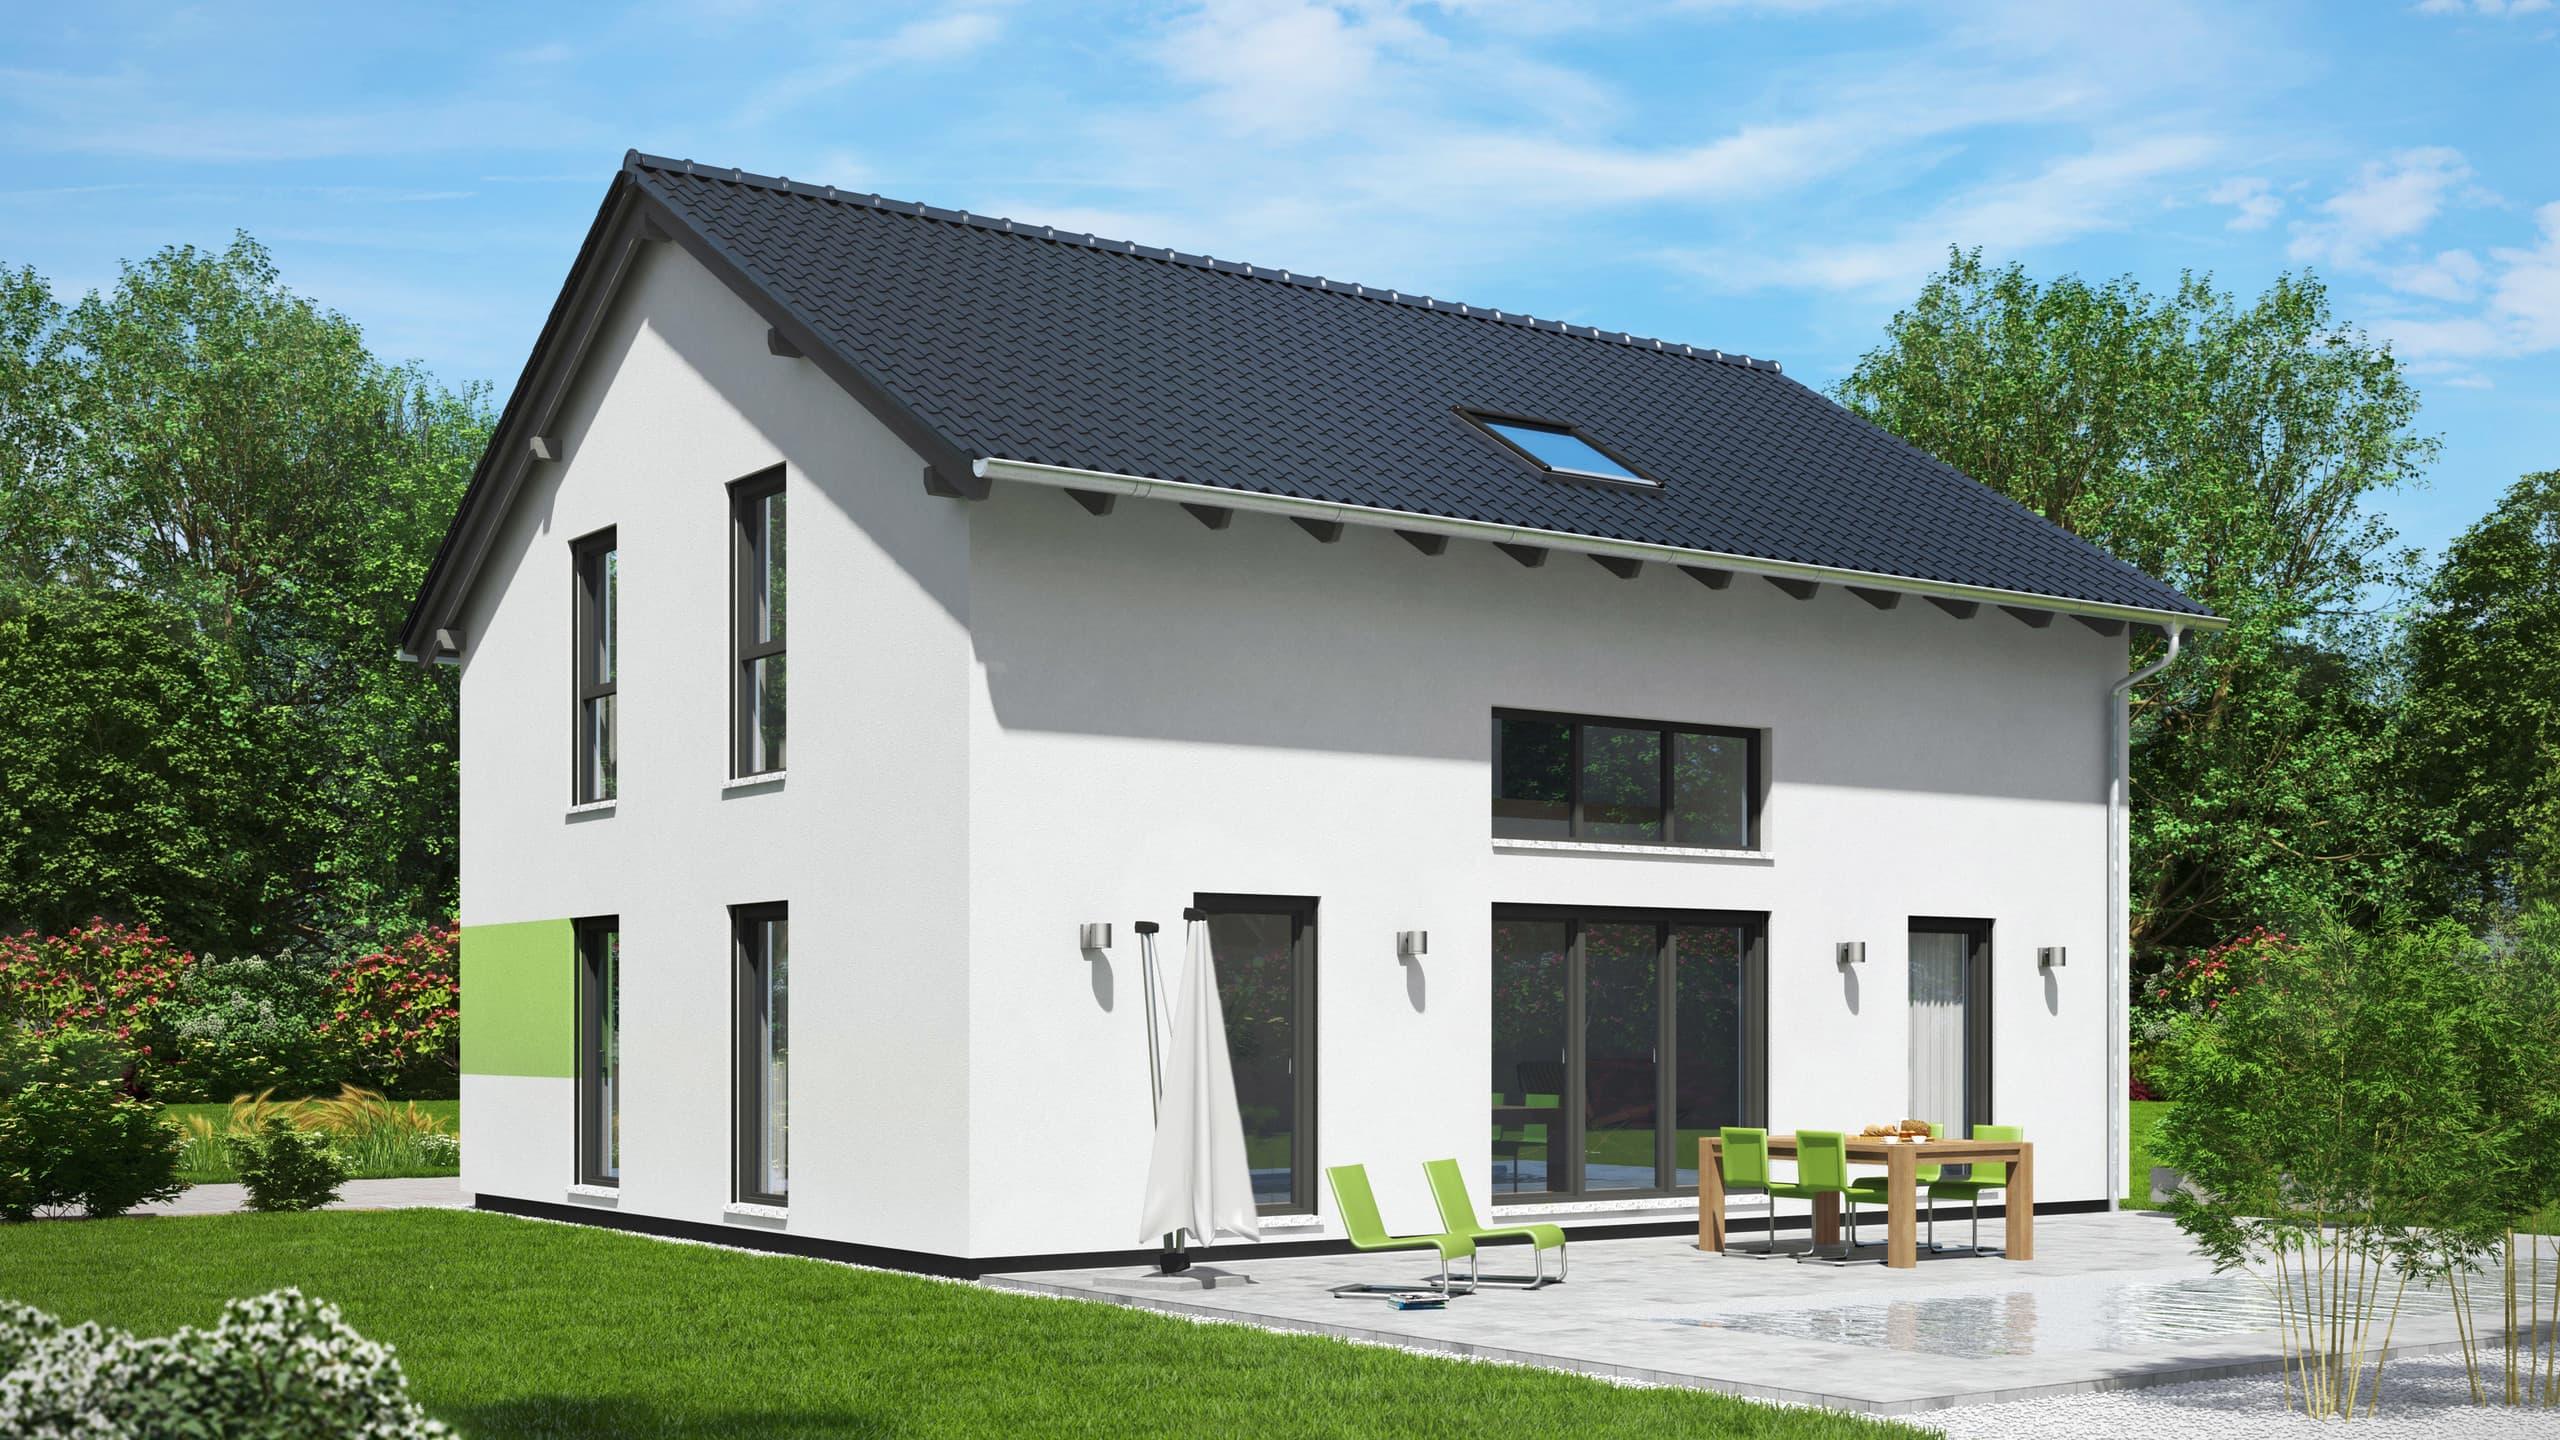 Fingerhut Haus Wien